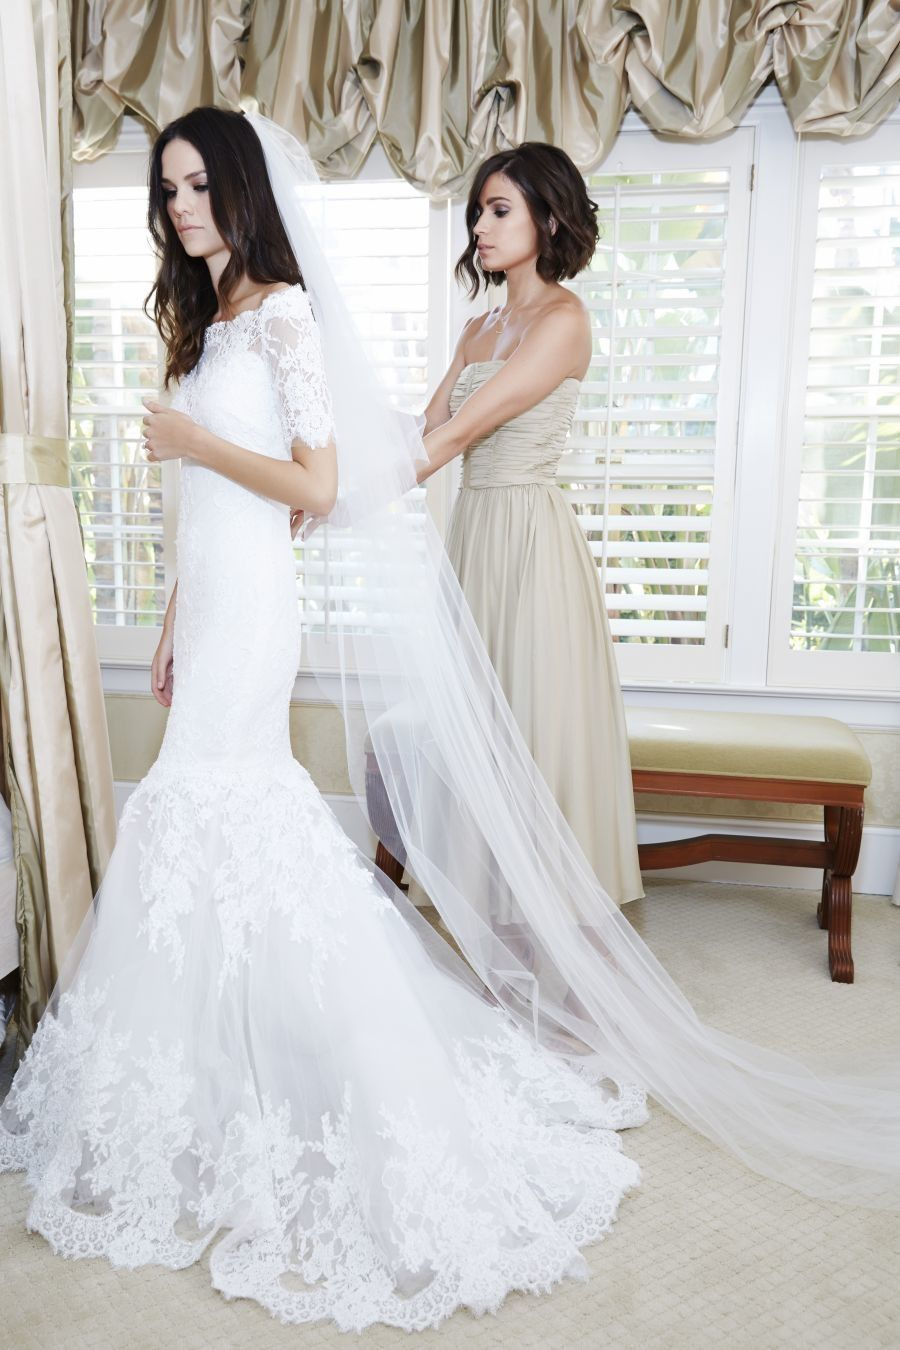 Elegant Beverly Hills Wedding of Allie Rizzo and Scott Sartiano ...